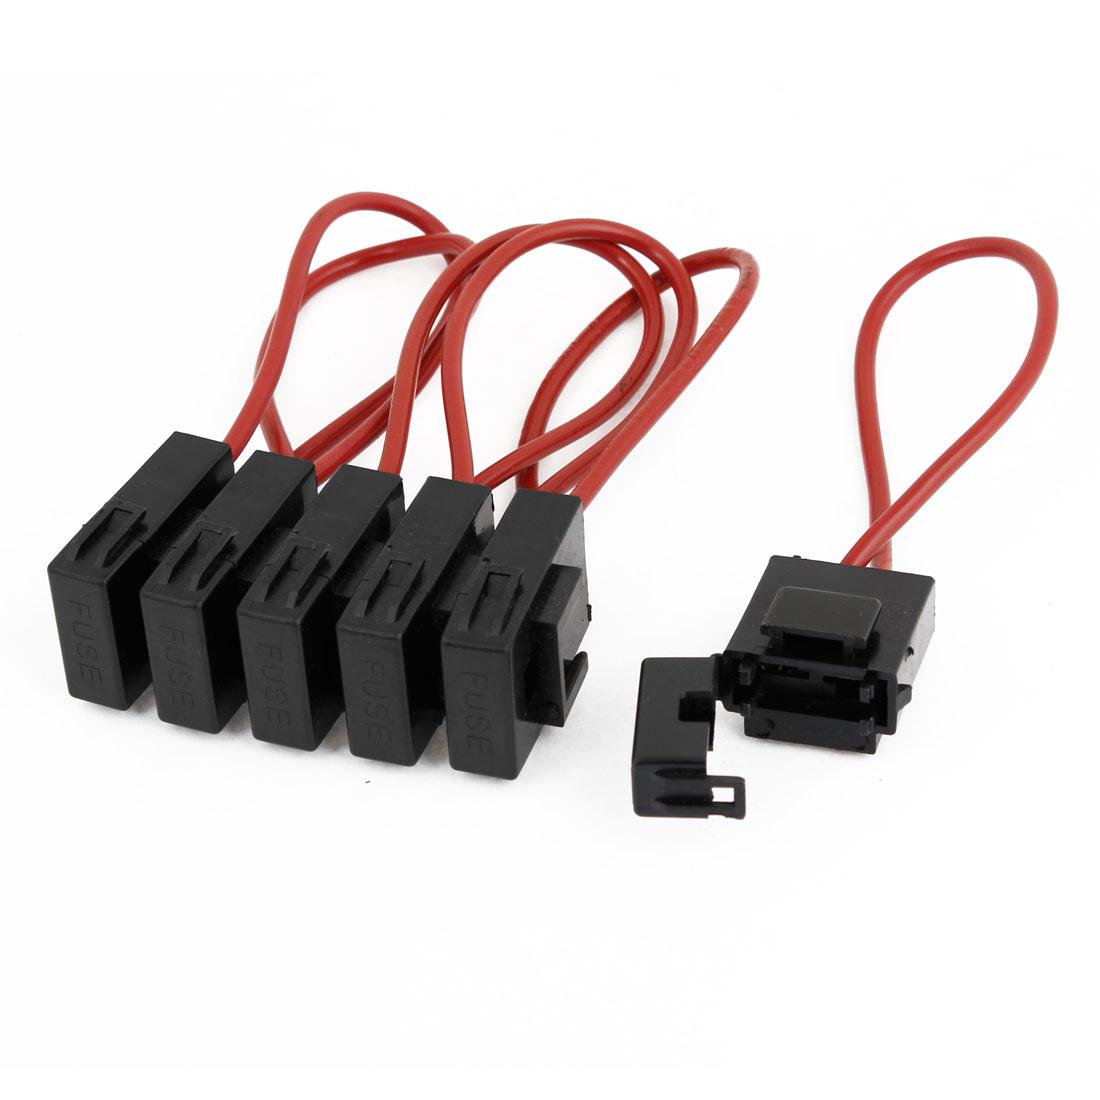 6 Pcs Auto Car Audio Inline Vane Fuse Holder Black Red DC 12V